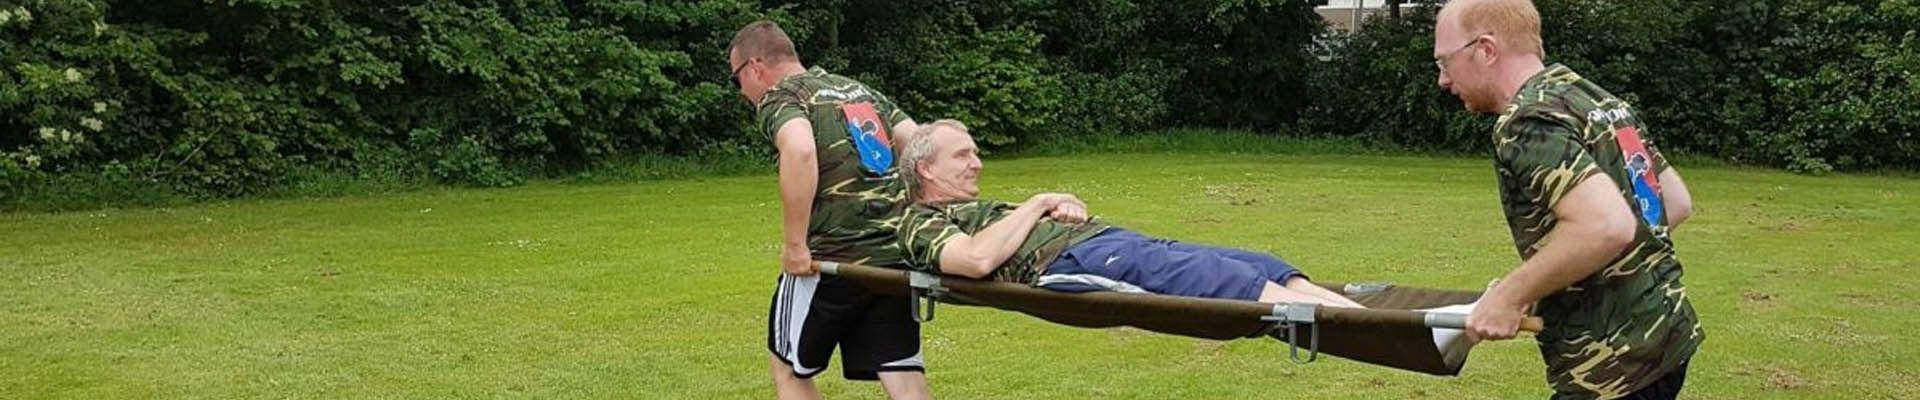 brancard race teambuilding activiteit